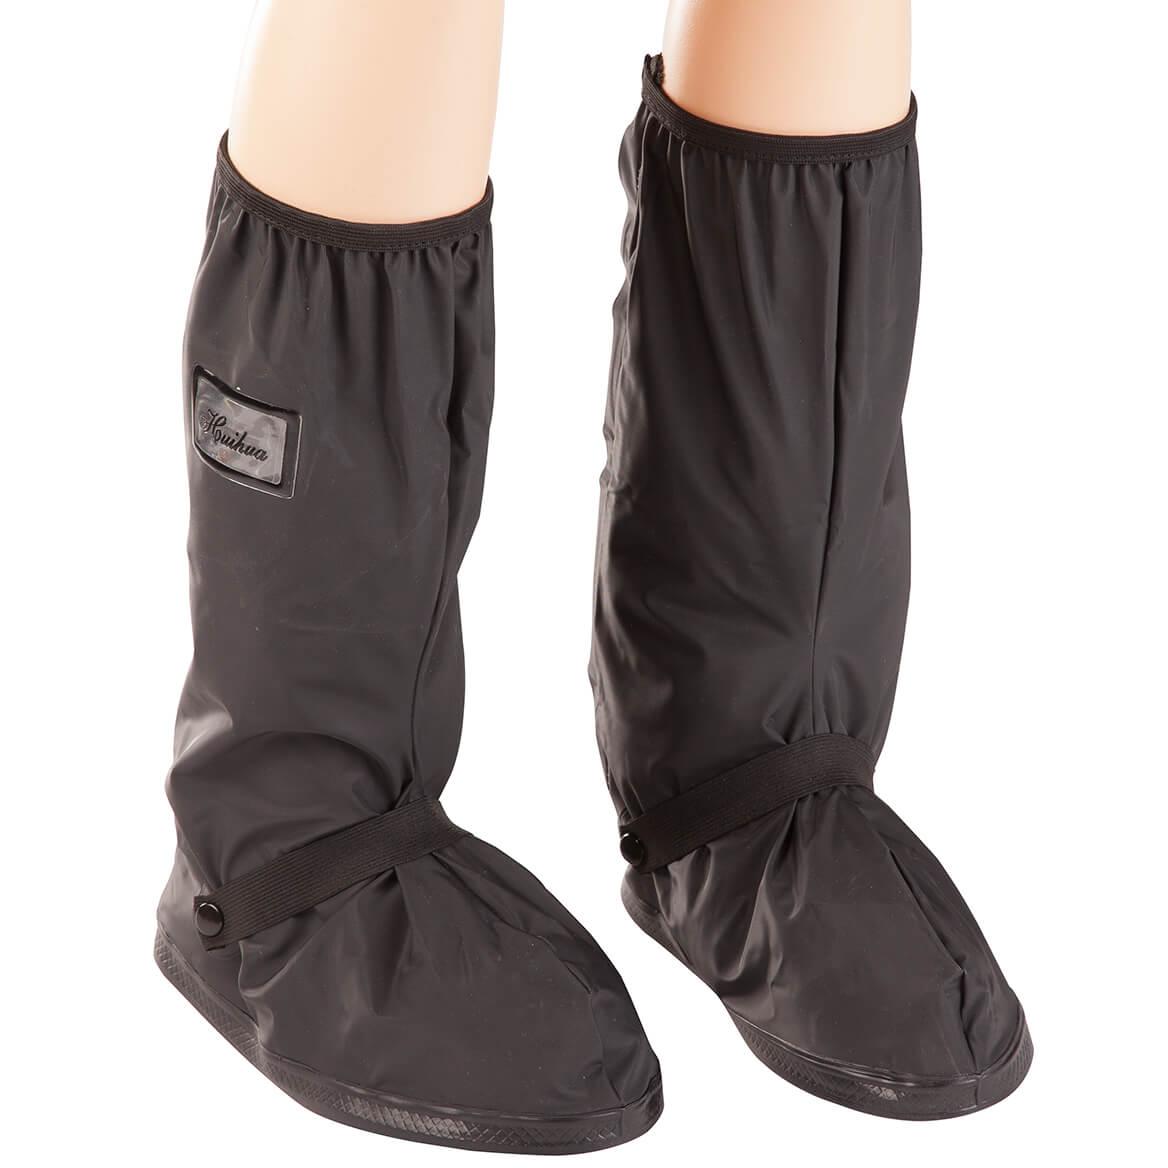 Waterproof Rain Boot Shoe Covers-368011